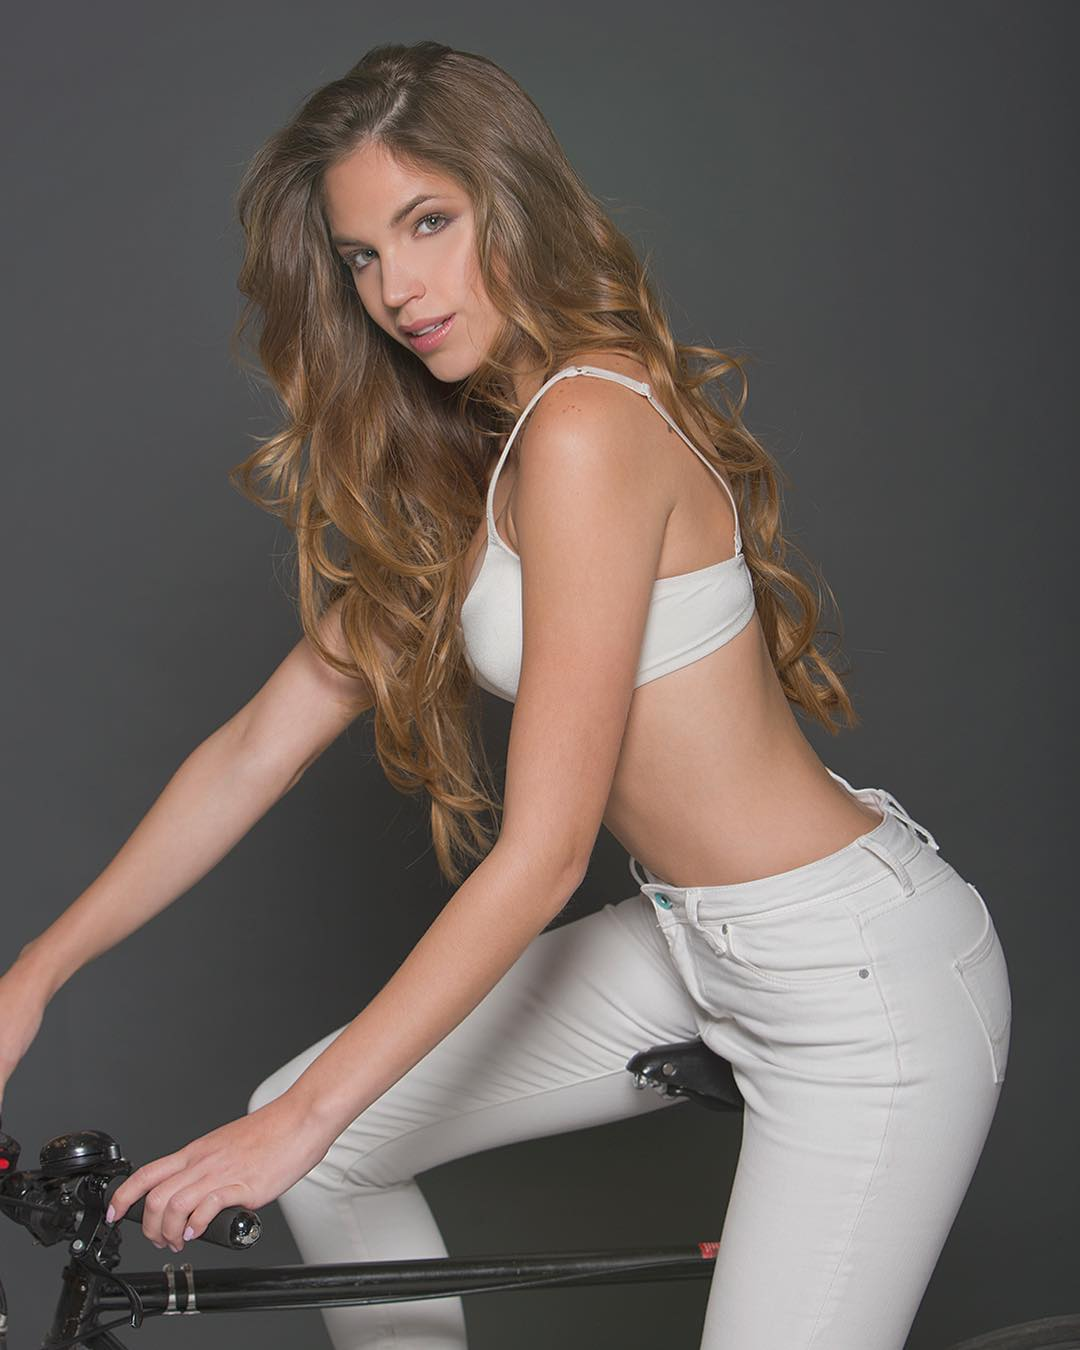 gina bitorzoli, miss intercontinental venezuela 2018-2019. 52vn5810